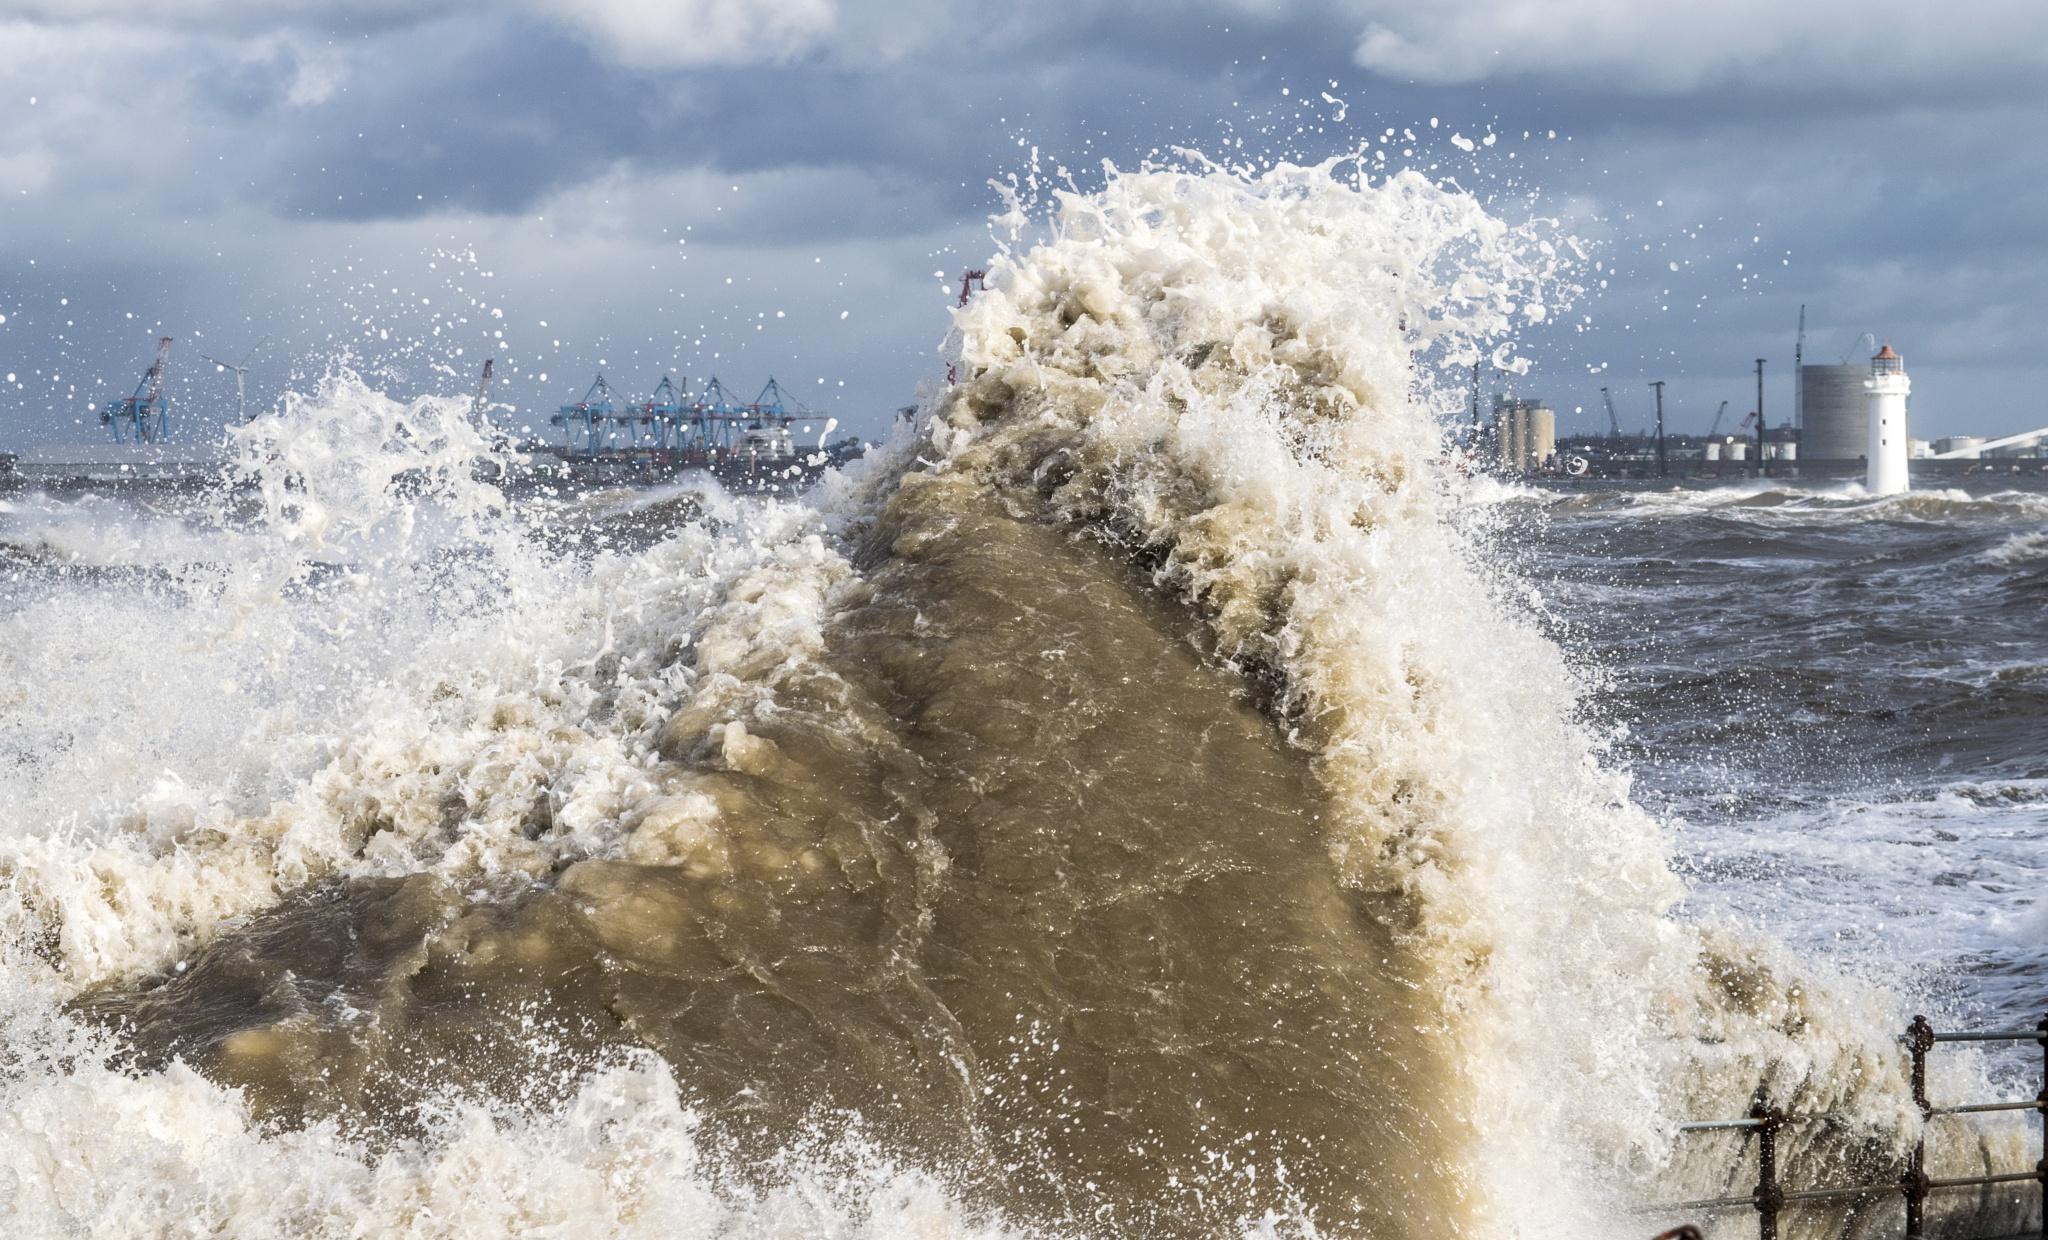 Sea Monster  by ILoveThatPhoto.co.uk